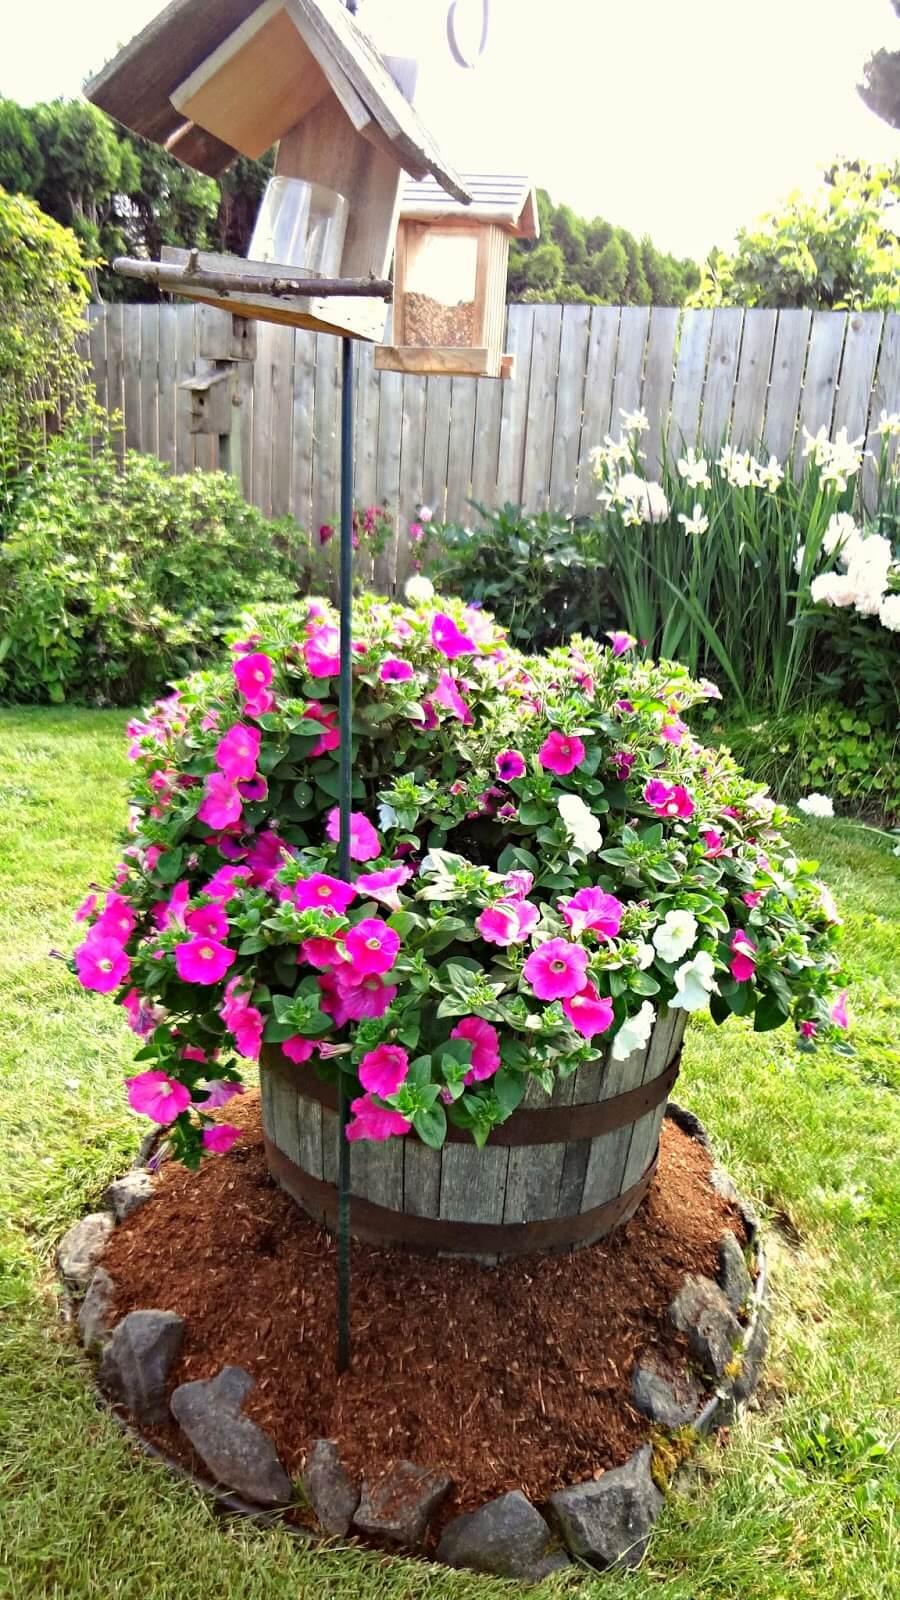 Barrel of Petunias by the Bird Feeder